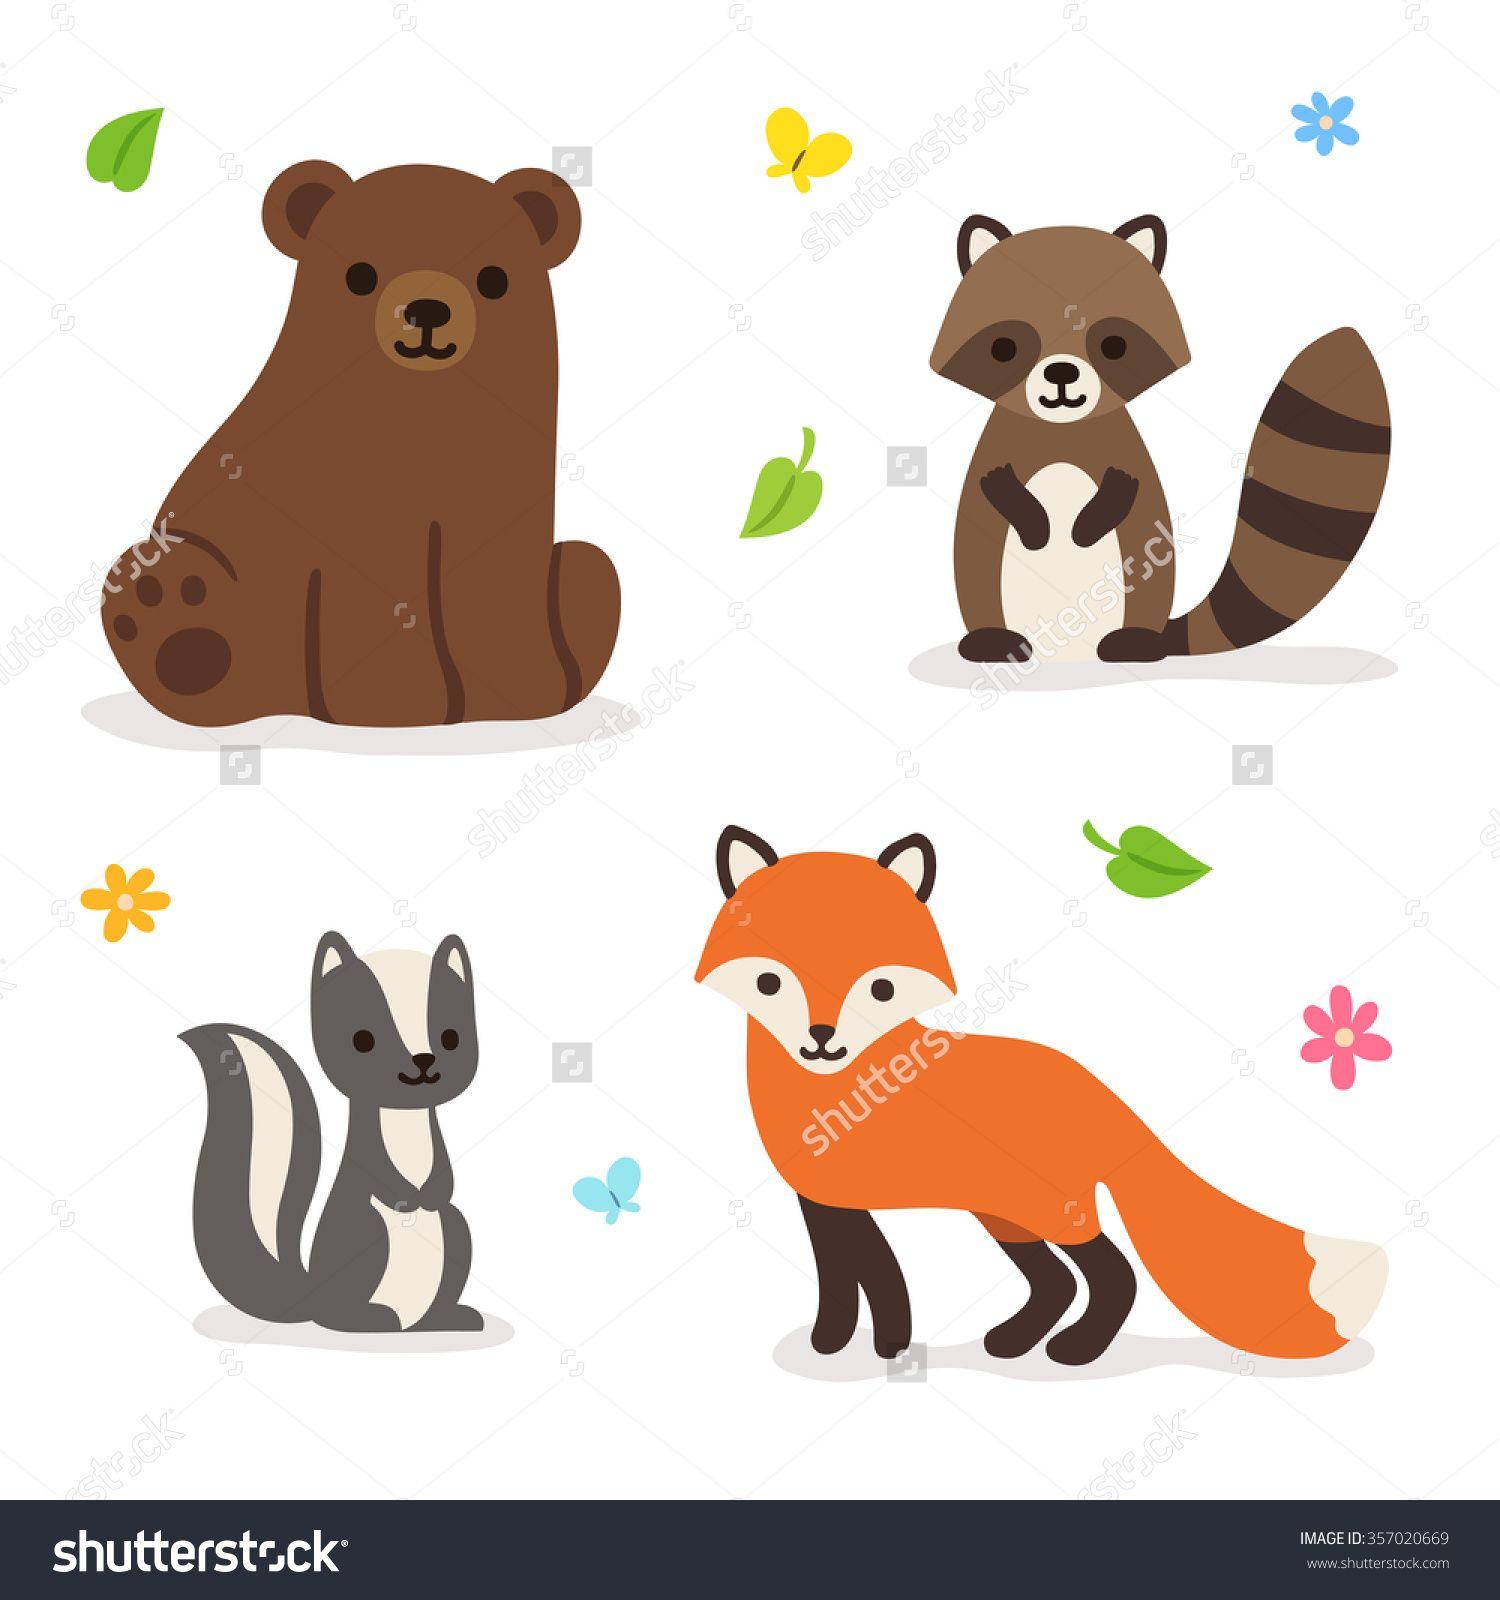 Cute Cartoon Forest Animals Bear, Fox Raccoon And Skunk